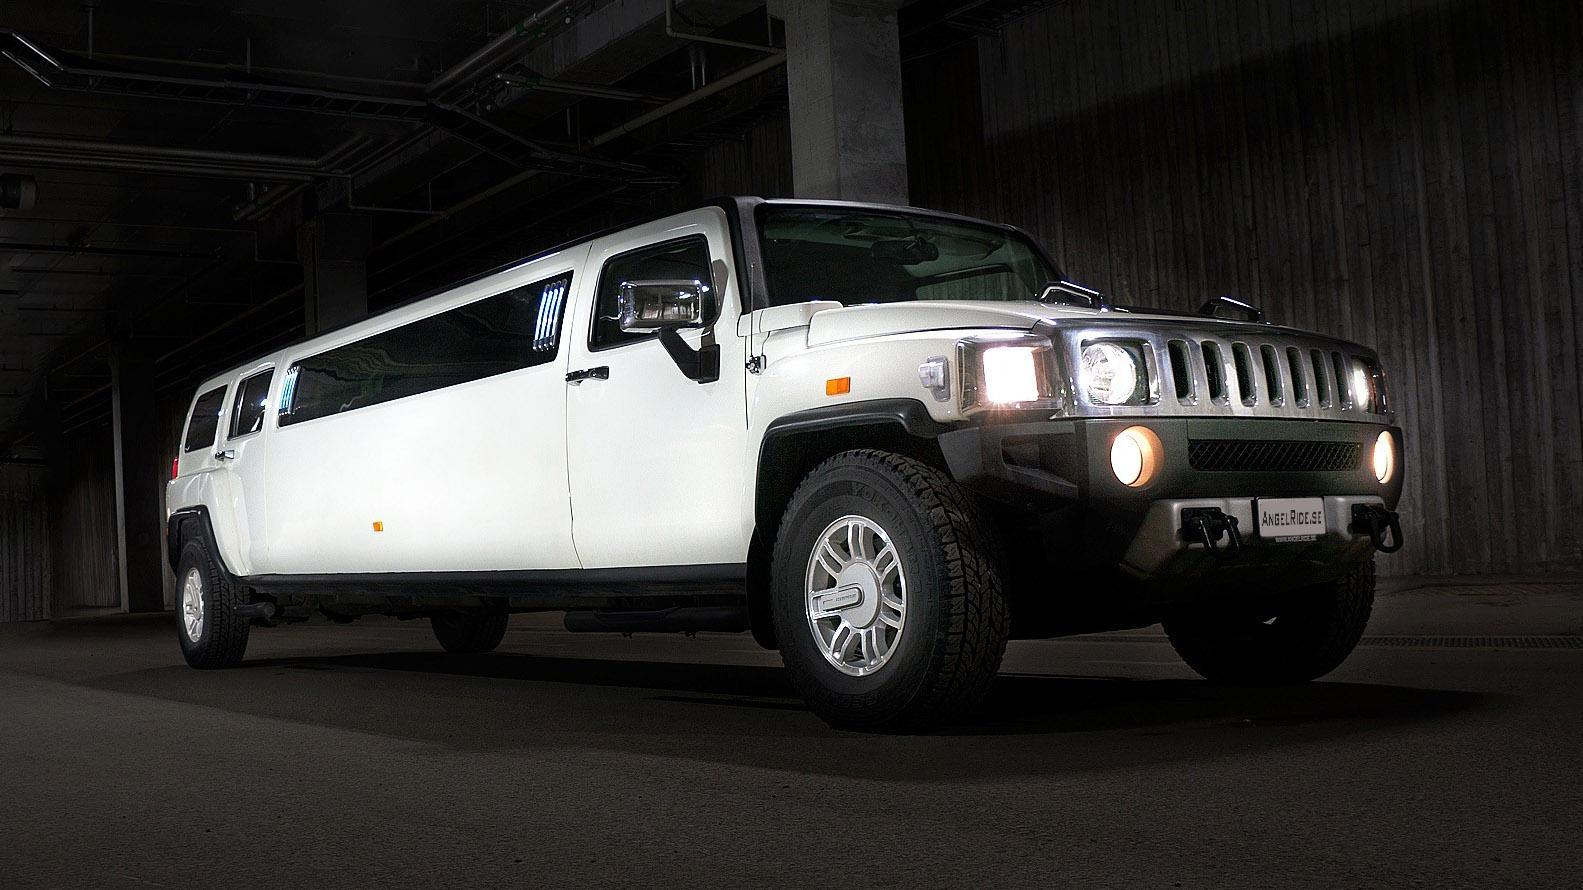 Sportschool met Hummer-service Hummer H2 limousine